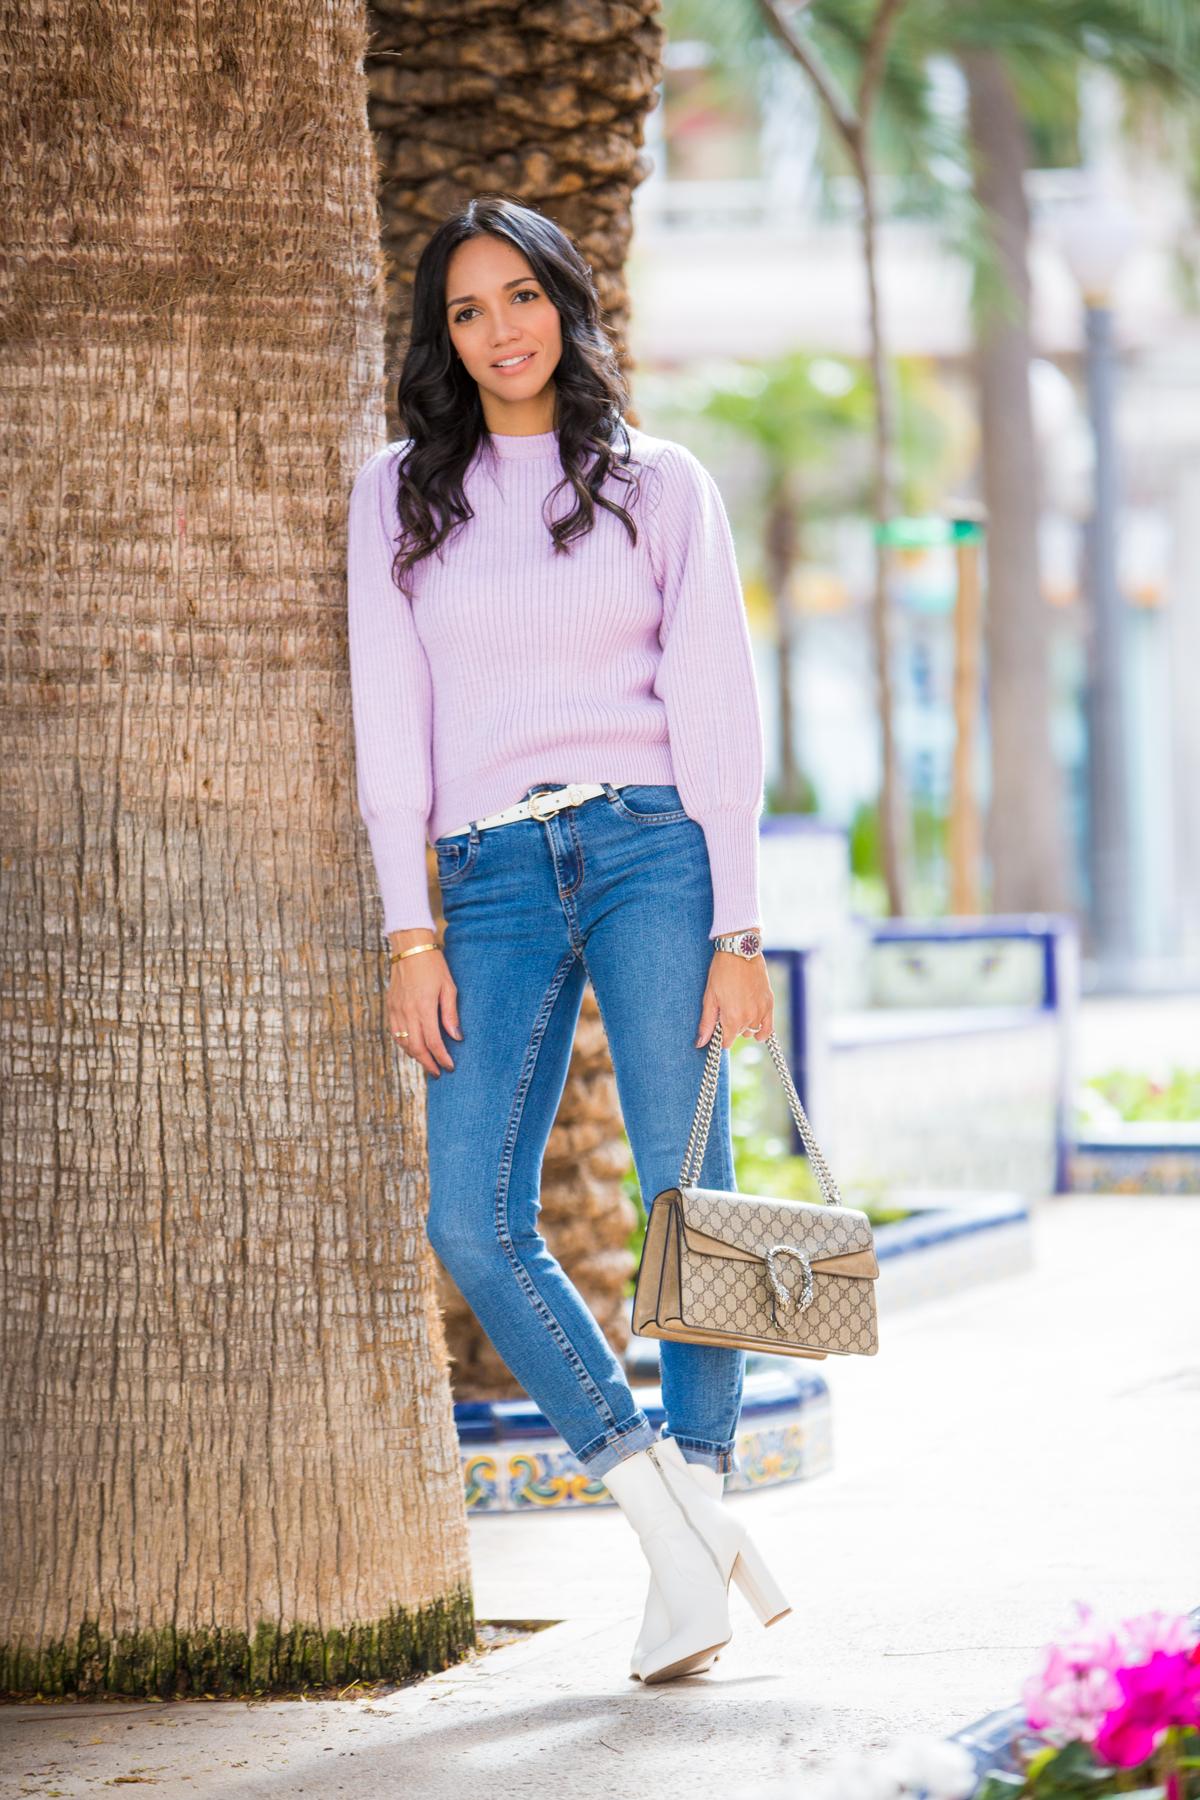 Carolina Personal Shopper Ultra violet